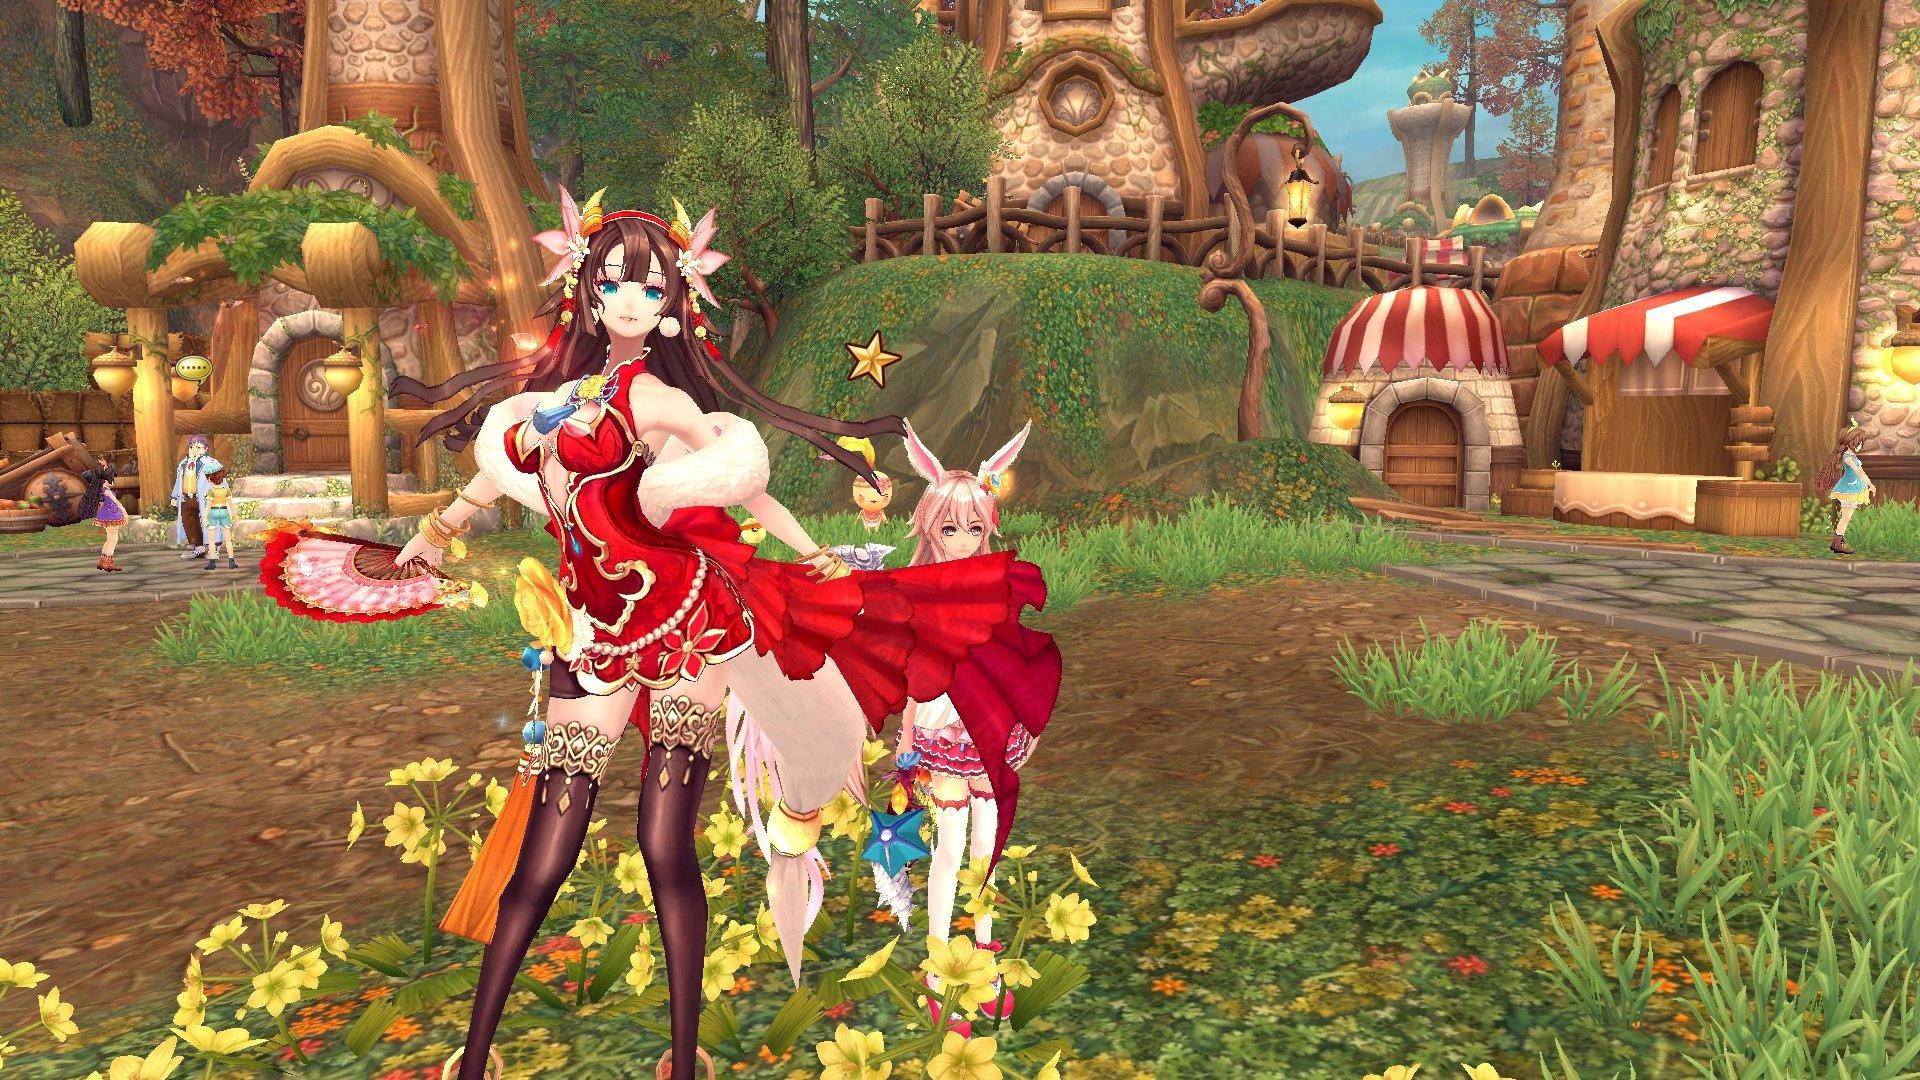 Fantasy Girl Wallpaper Aura Kingdom Anime Mmo Rpg Online Fantasy Adventure 1aking